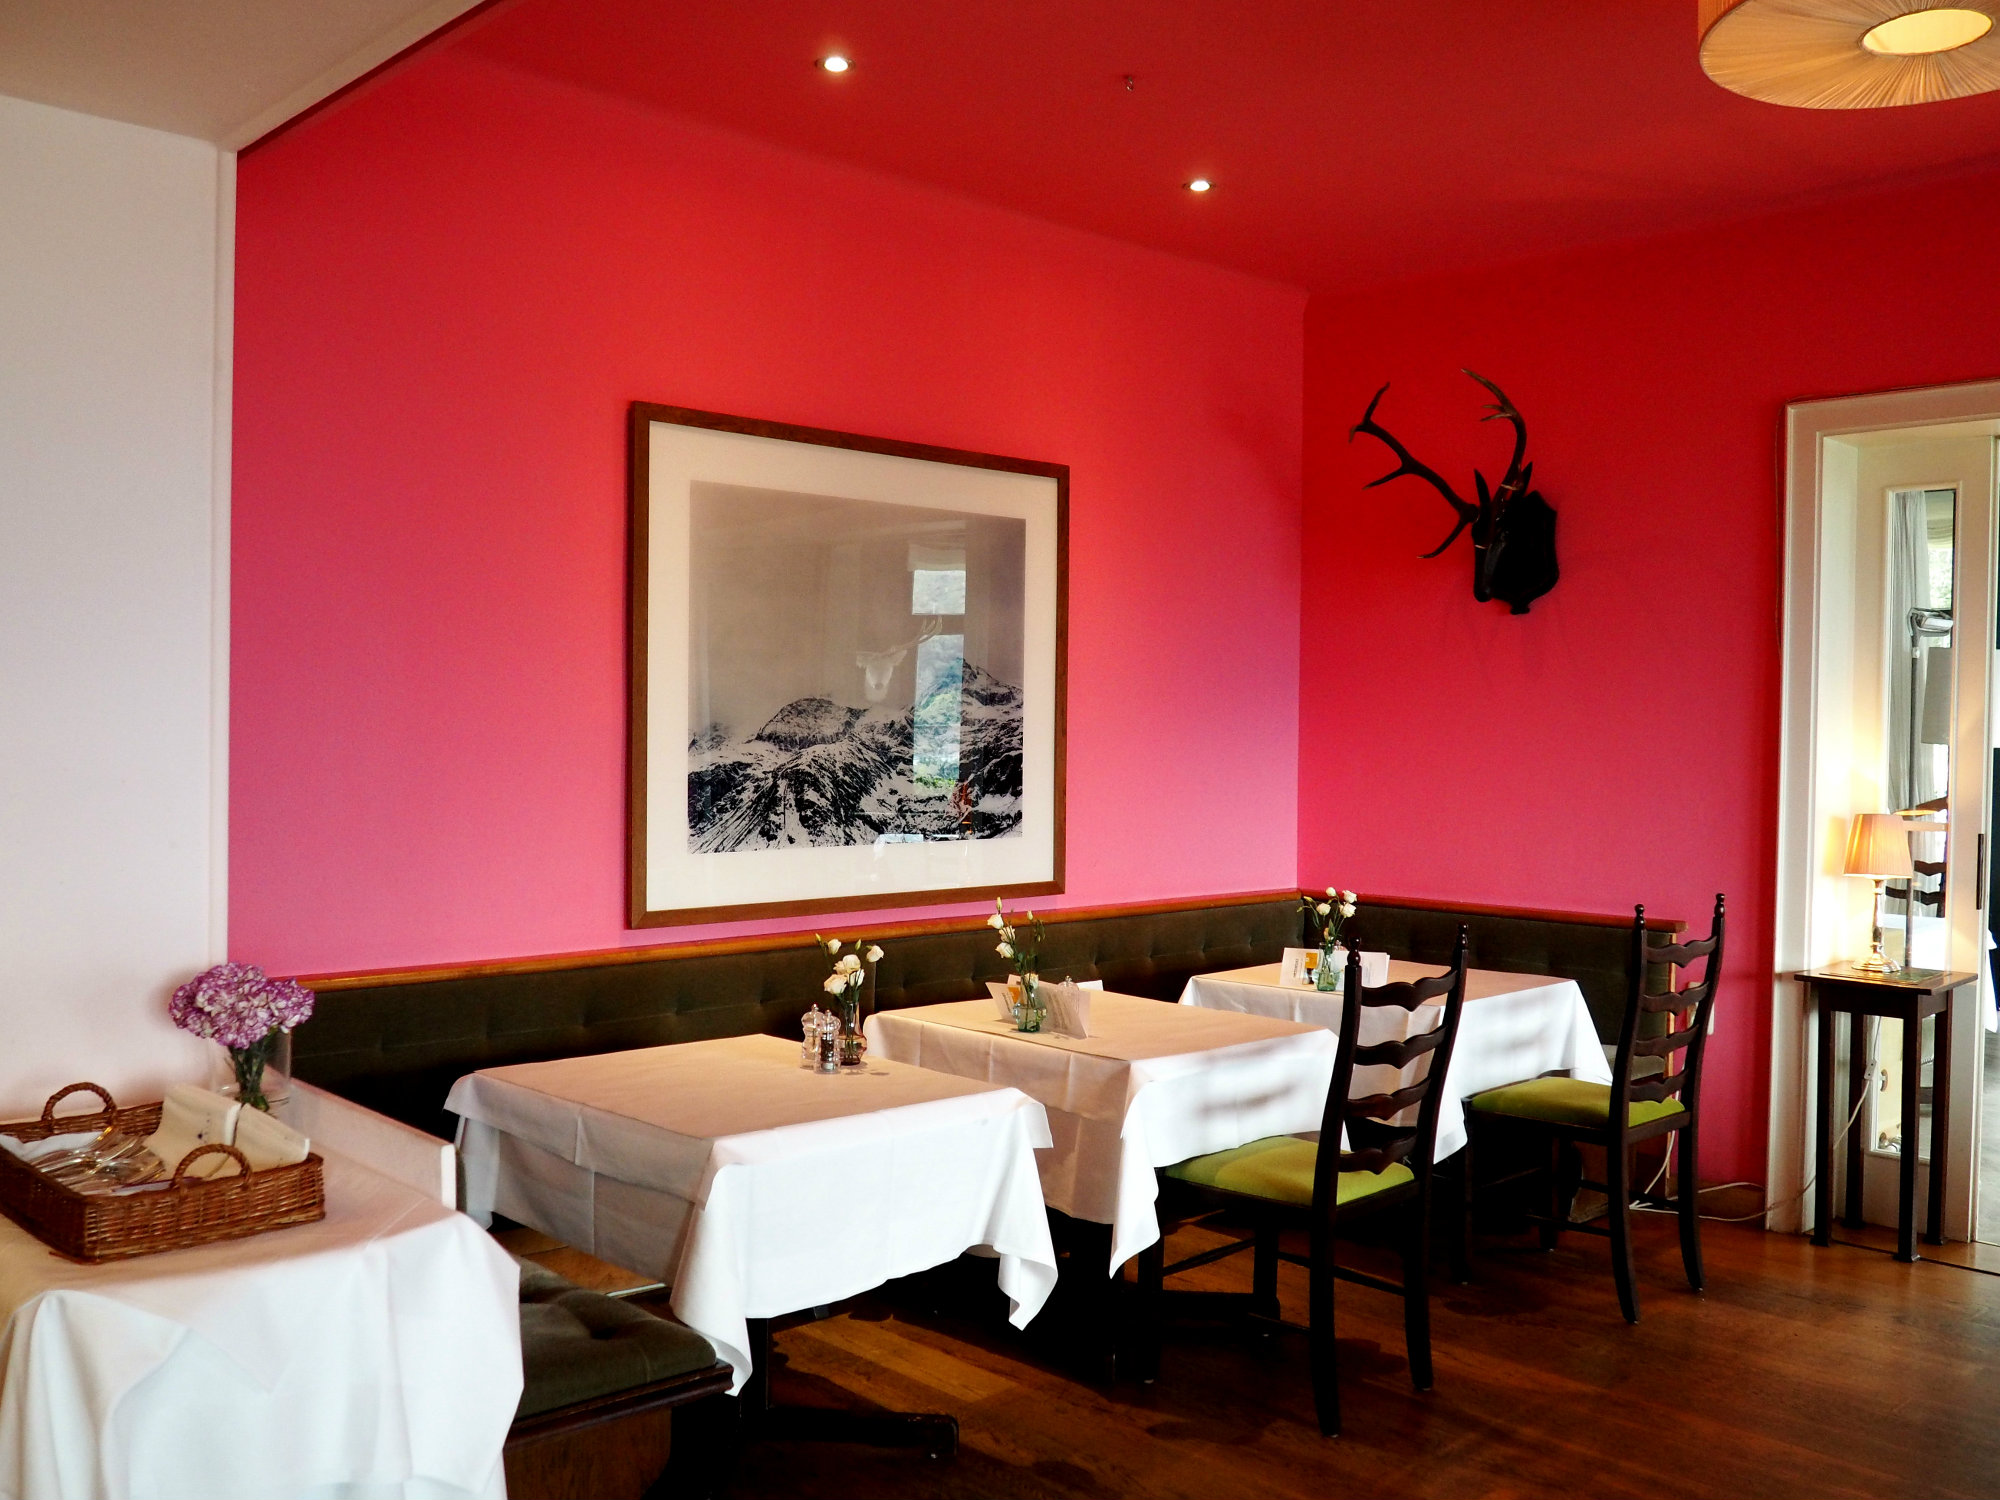 Haus Hirt restaurant